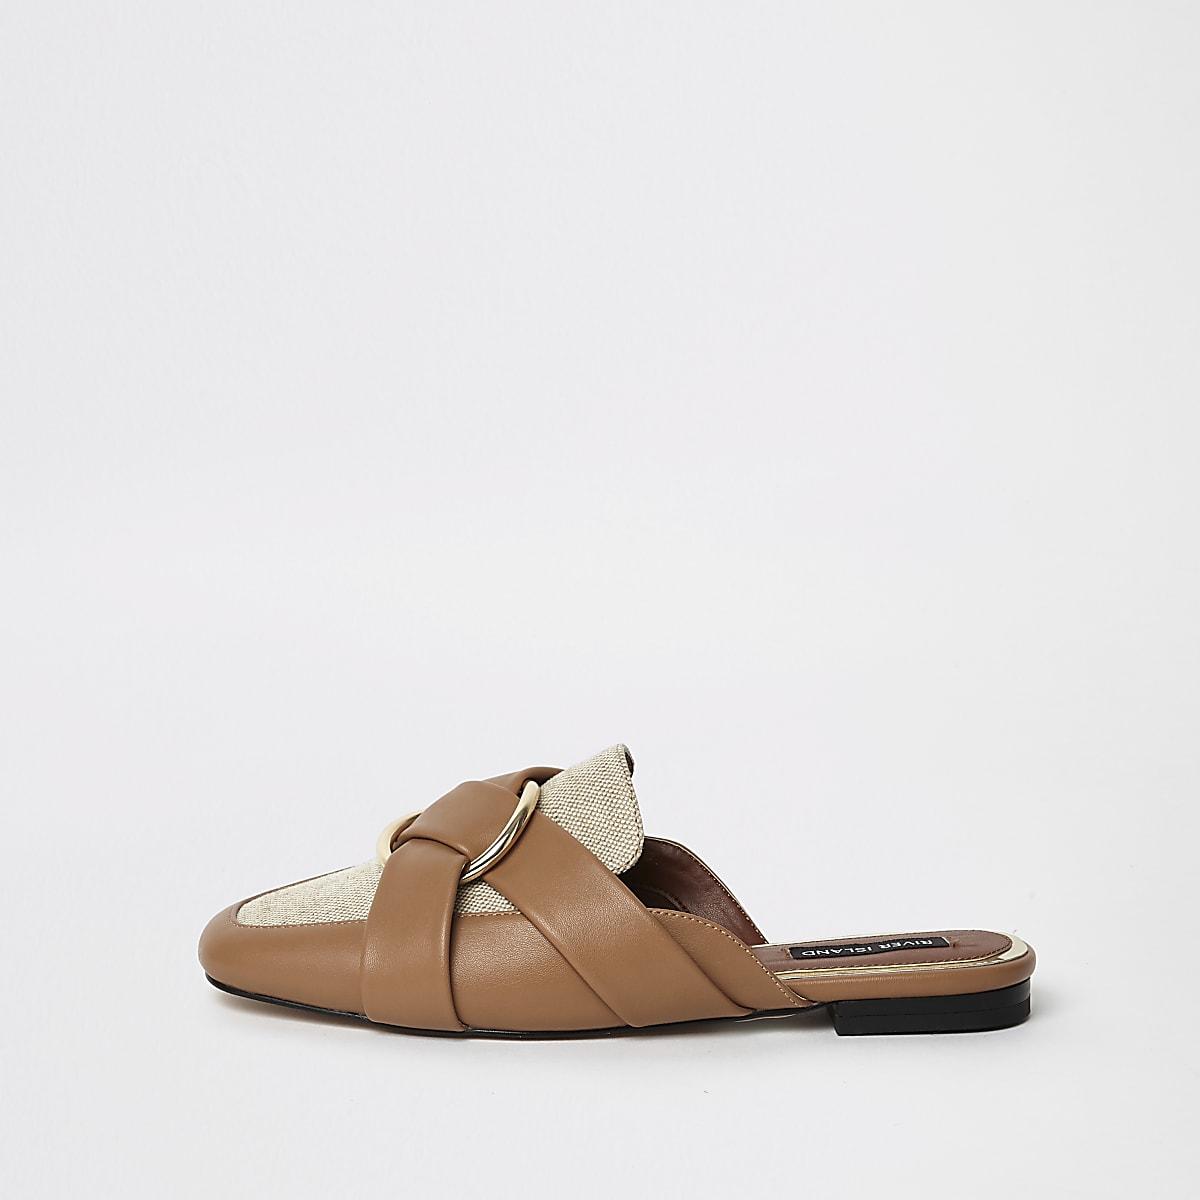 Braune Loafer